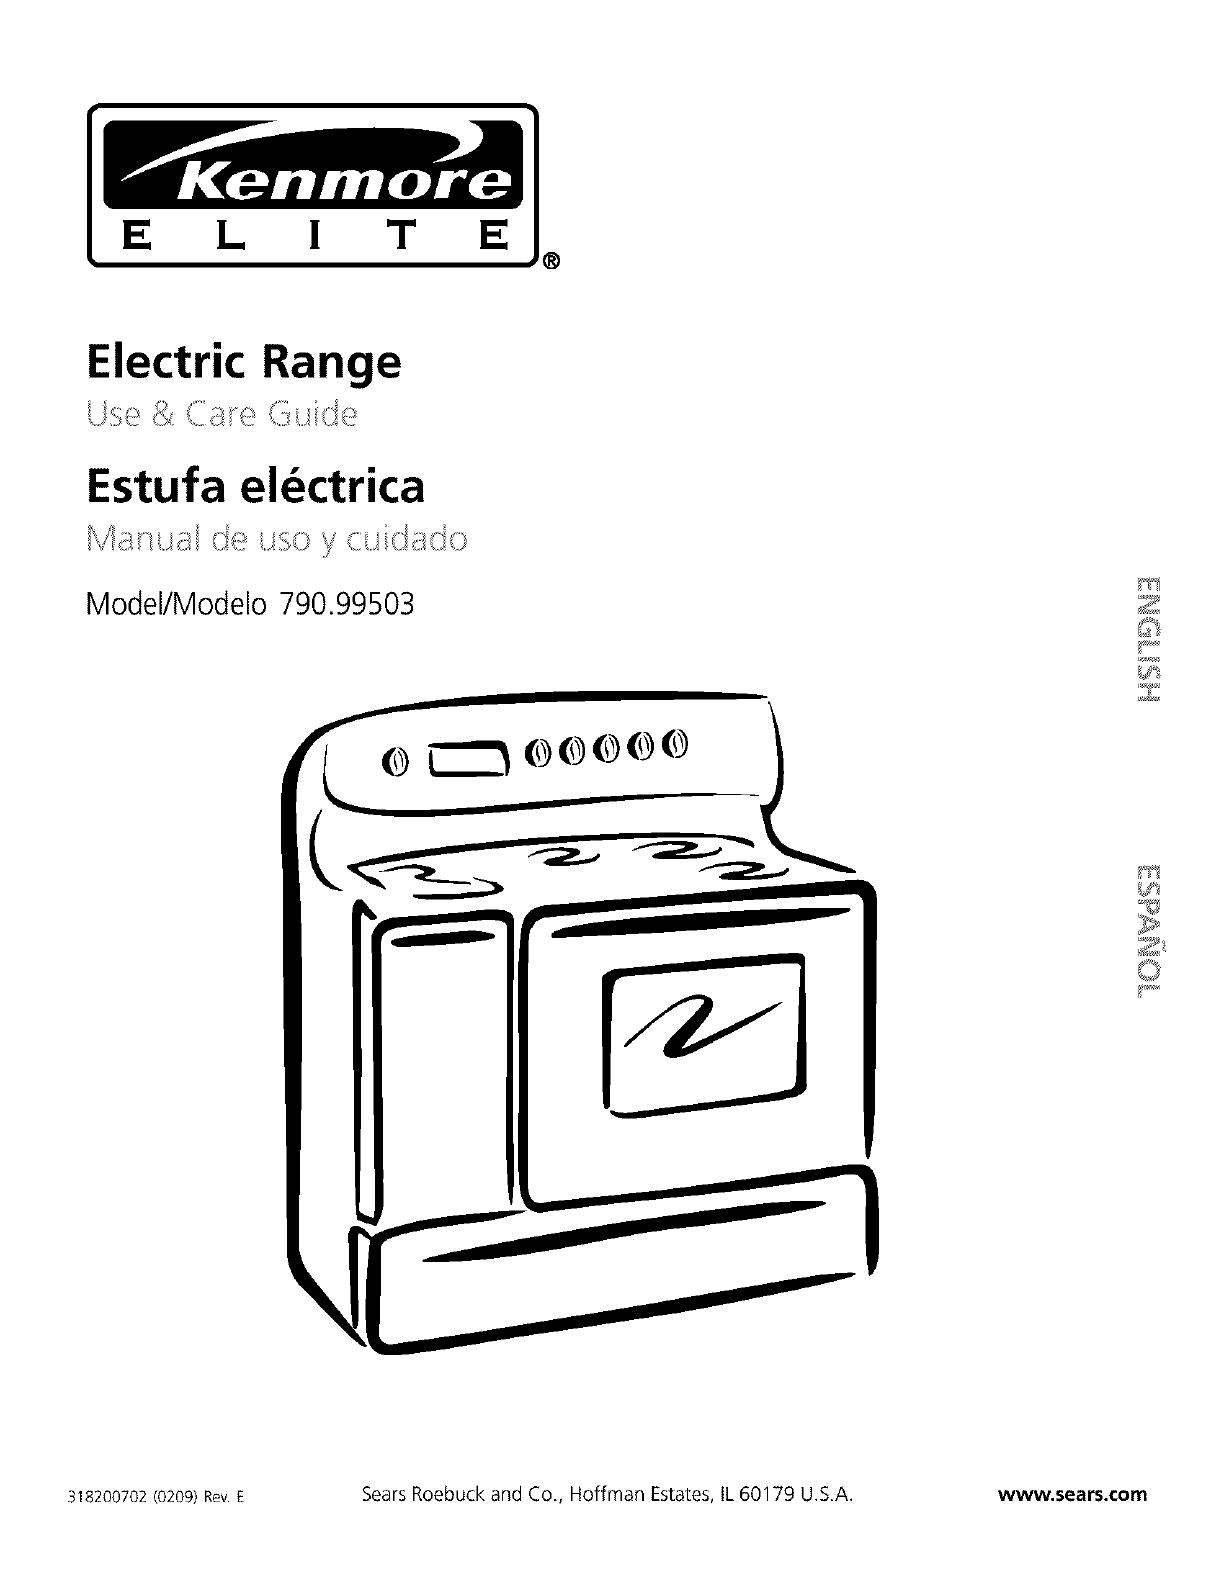 Kenmore Elite 79099503994 User Manual Electric Range Manuals And Guides L0302115